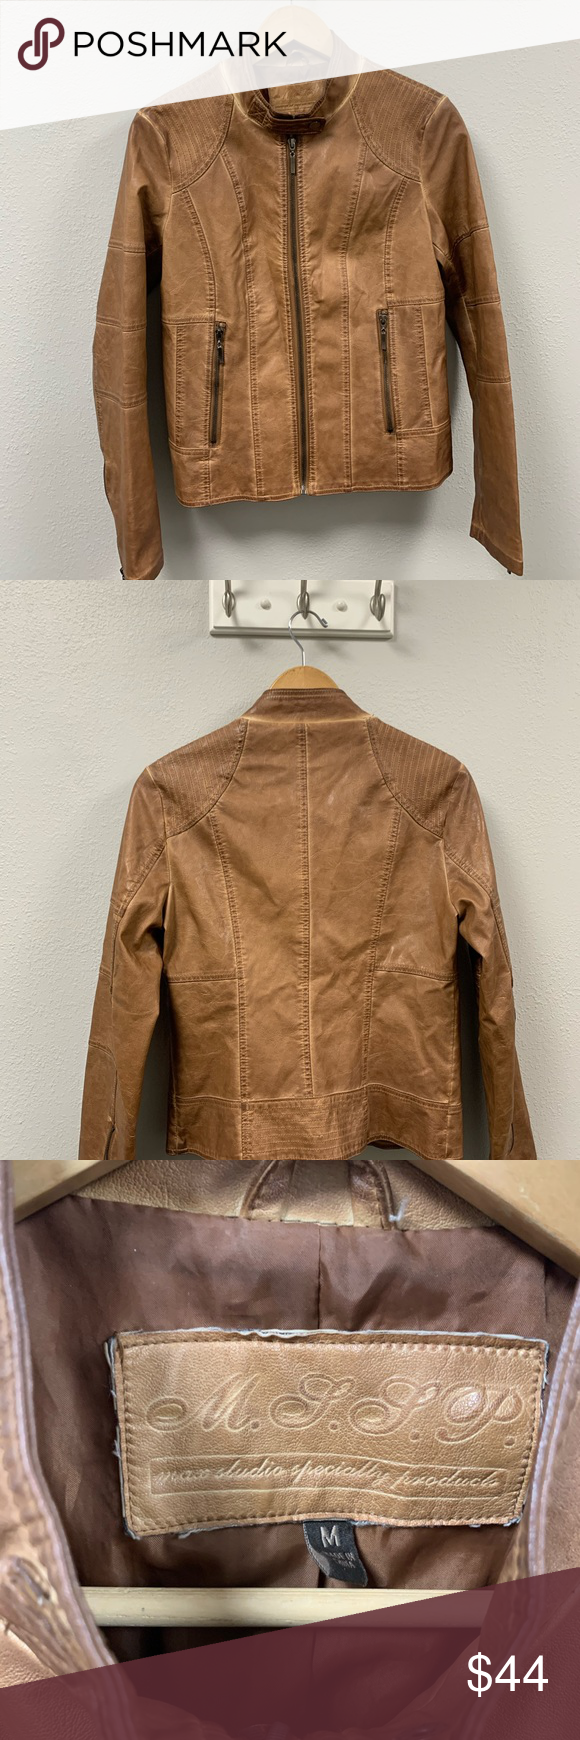 Vegan Leather Distressed Jacket Jackets Distressed Jacket Vegan Leather [ 1740 x 580 Pixel ]